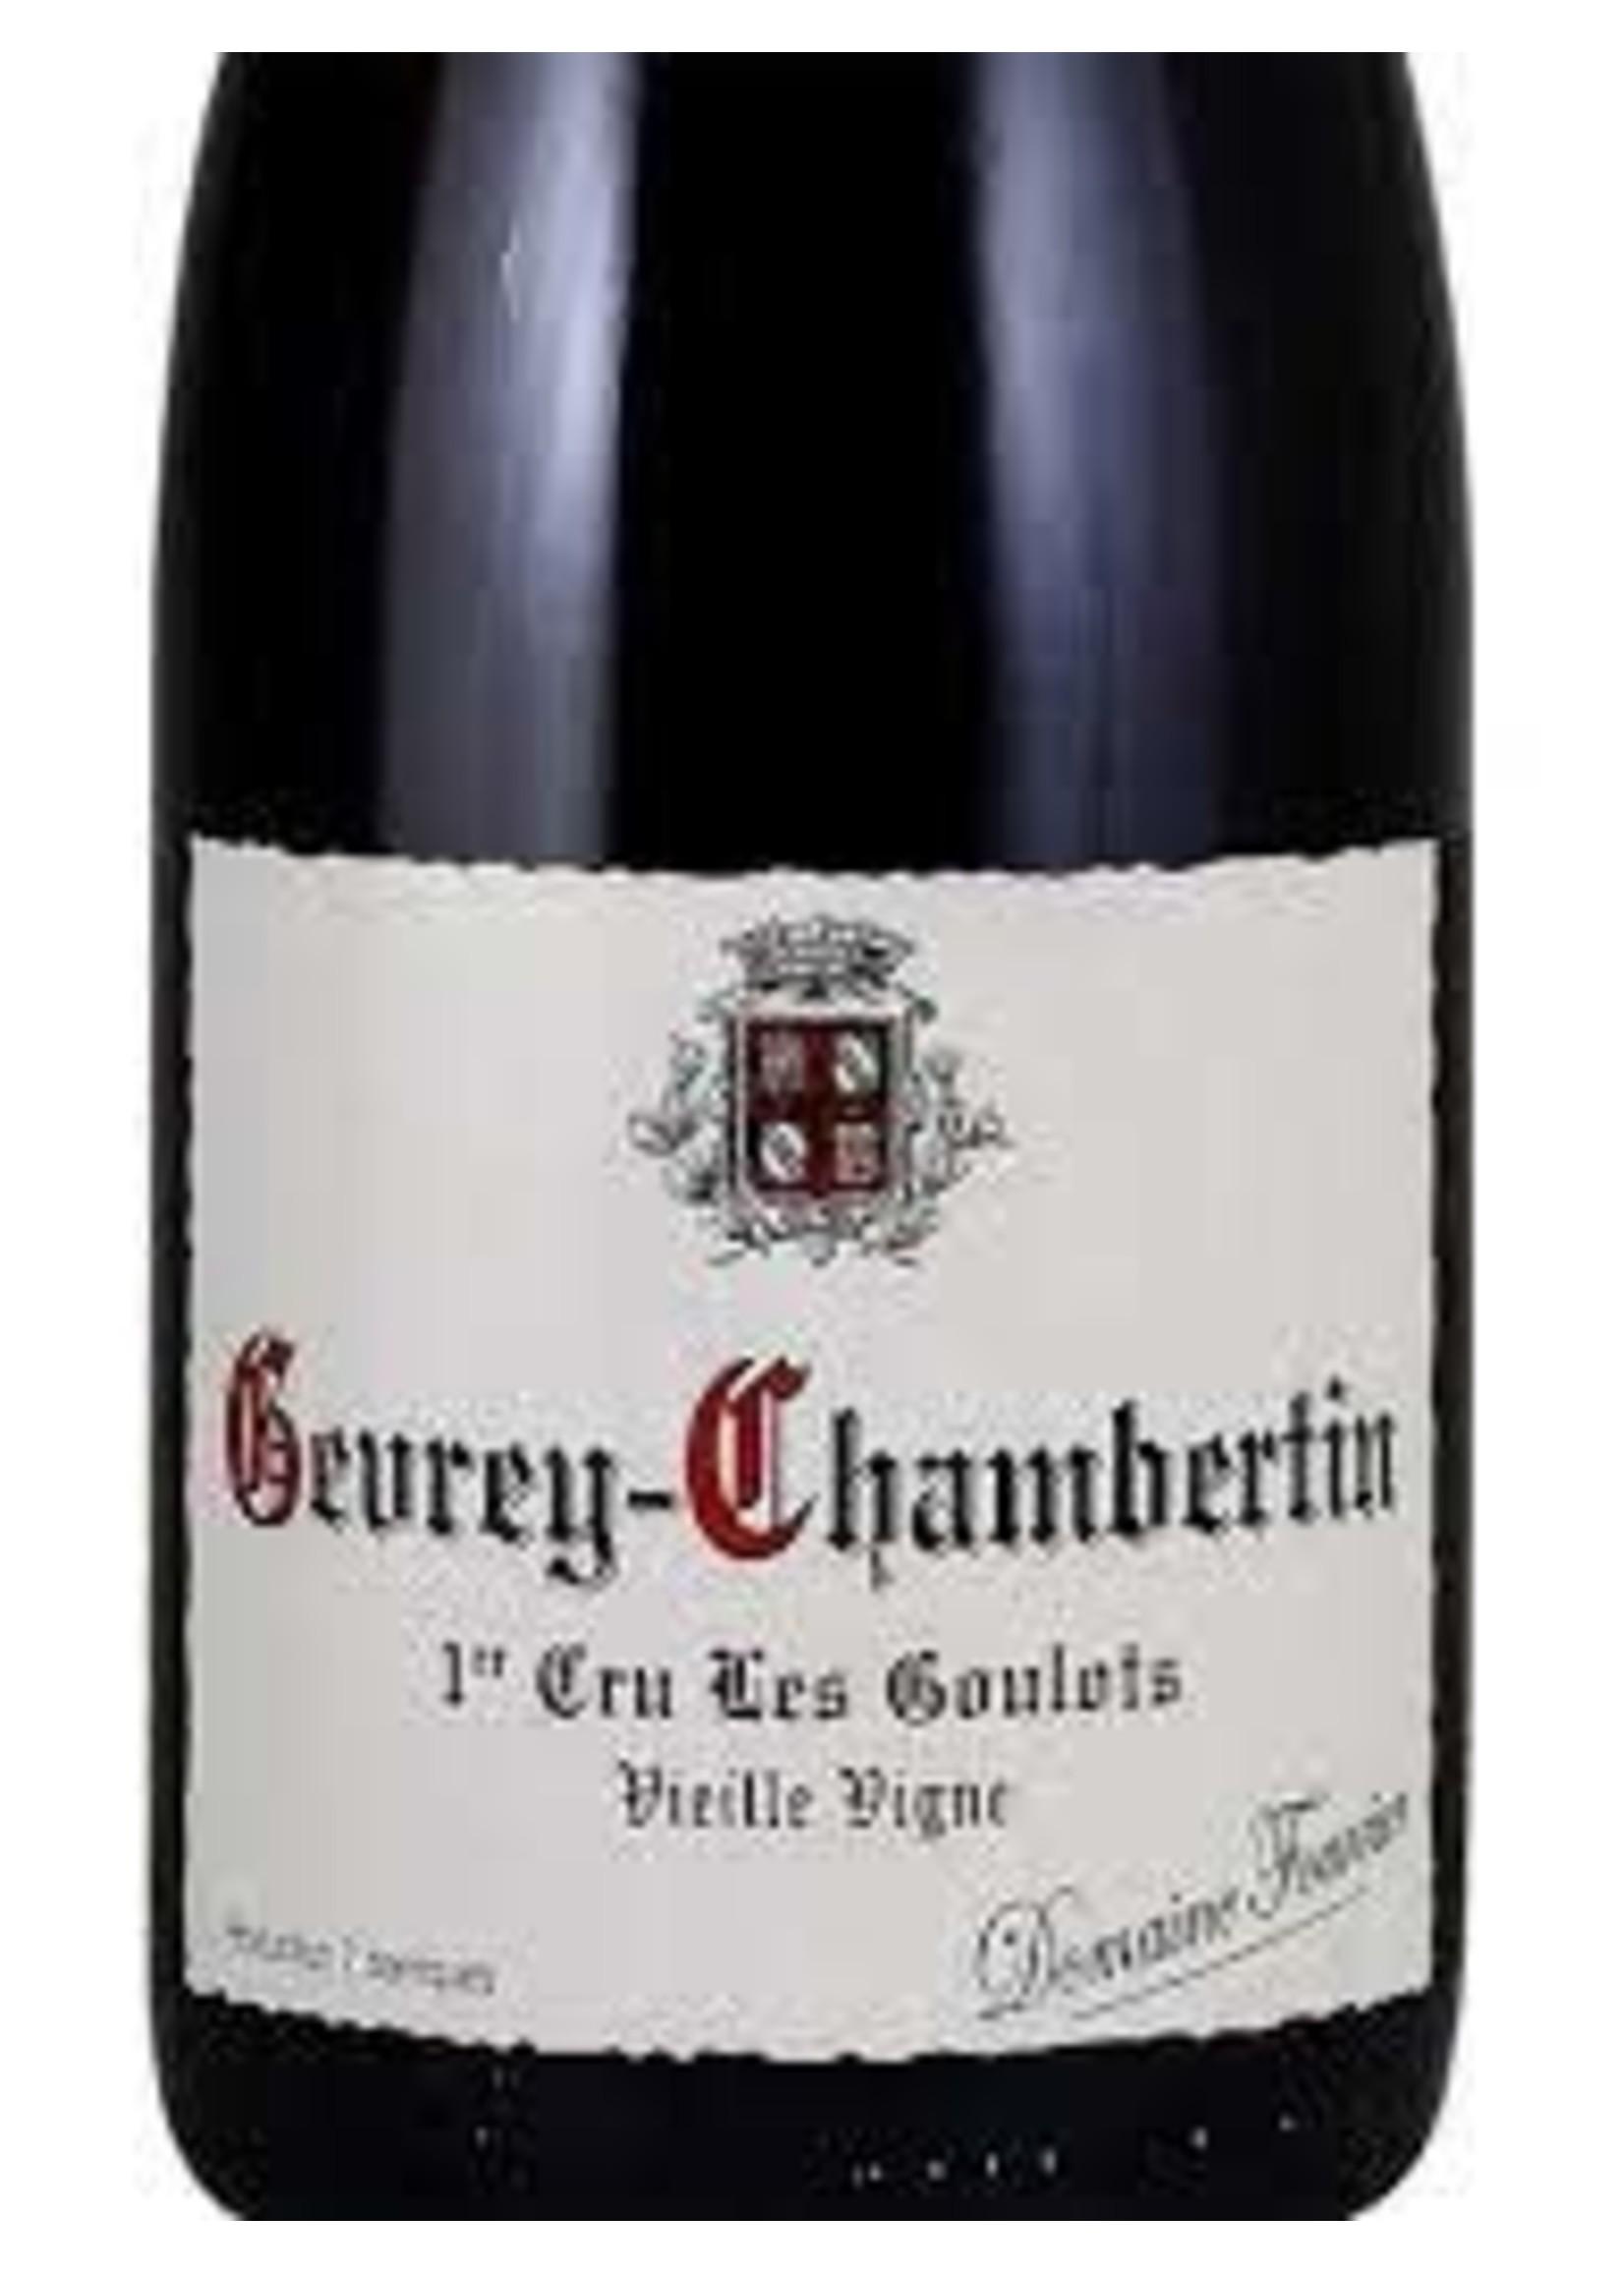 Domaine Fourrier 2015 Gevrey Chambertin 1er Cru 'Les Goulots' Vieilles Vignes 750ml [PRE-ARRIVAL]